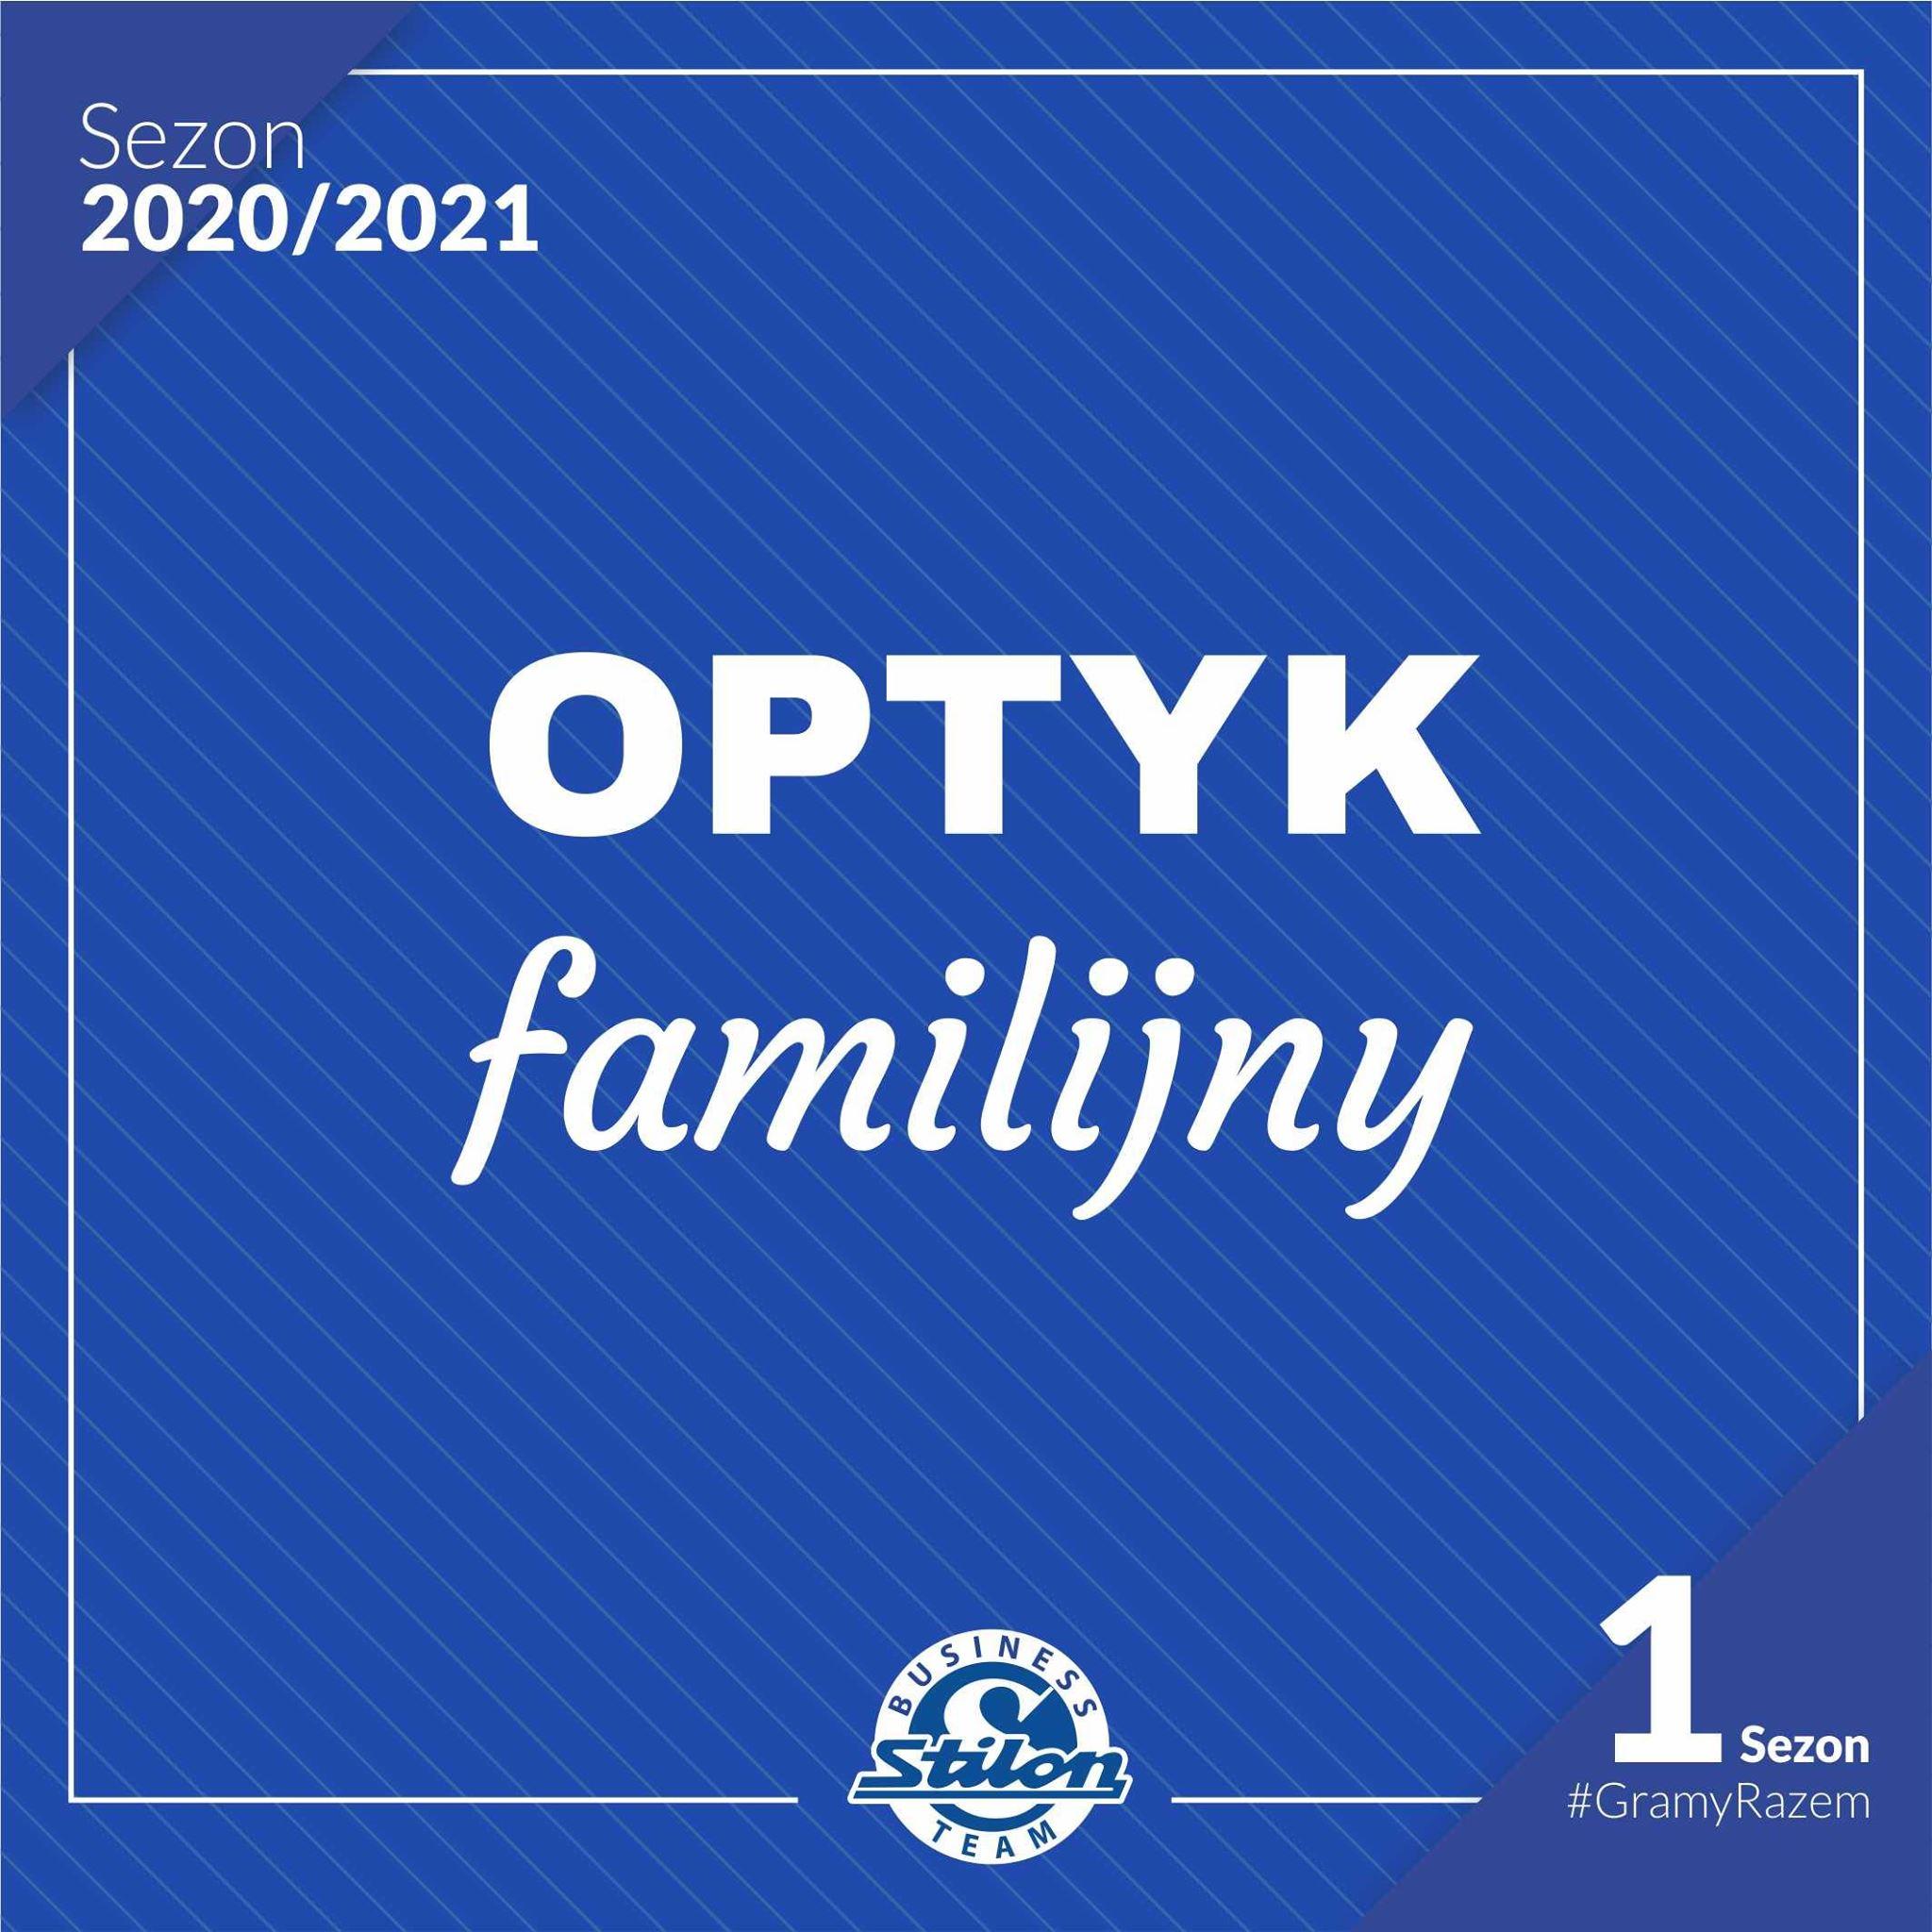 https://stilon.gorzow.pl/wp-content/uploads/2020/09/OPTYK_FAMILIJNY.jpg